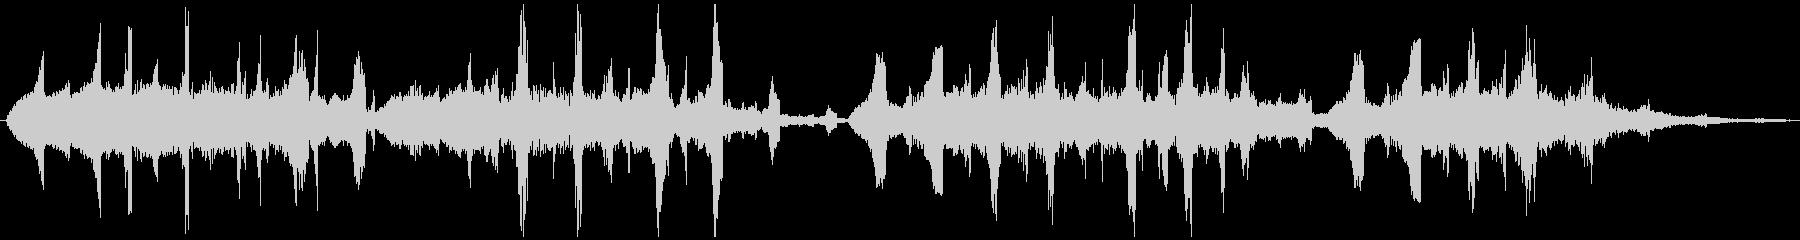 PADS グリッチートランス02の未再生の波形